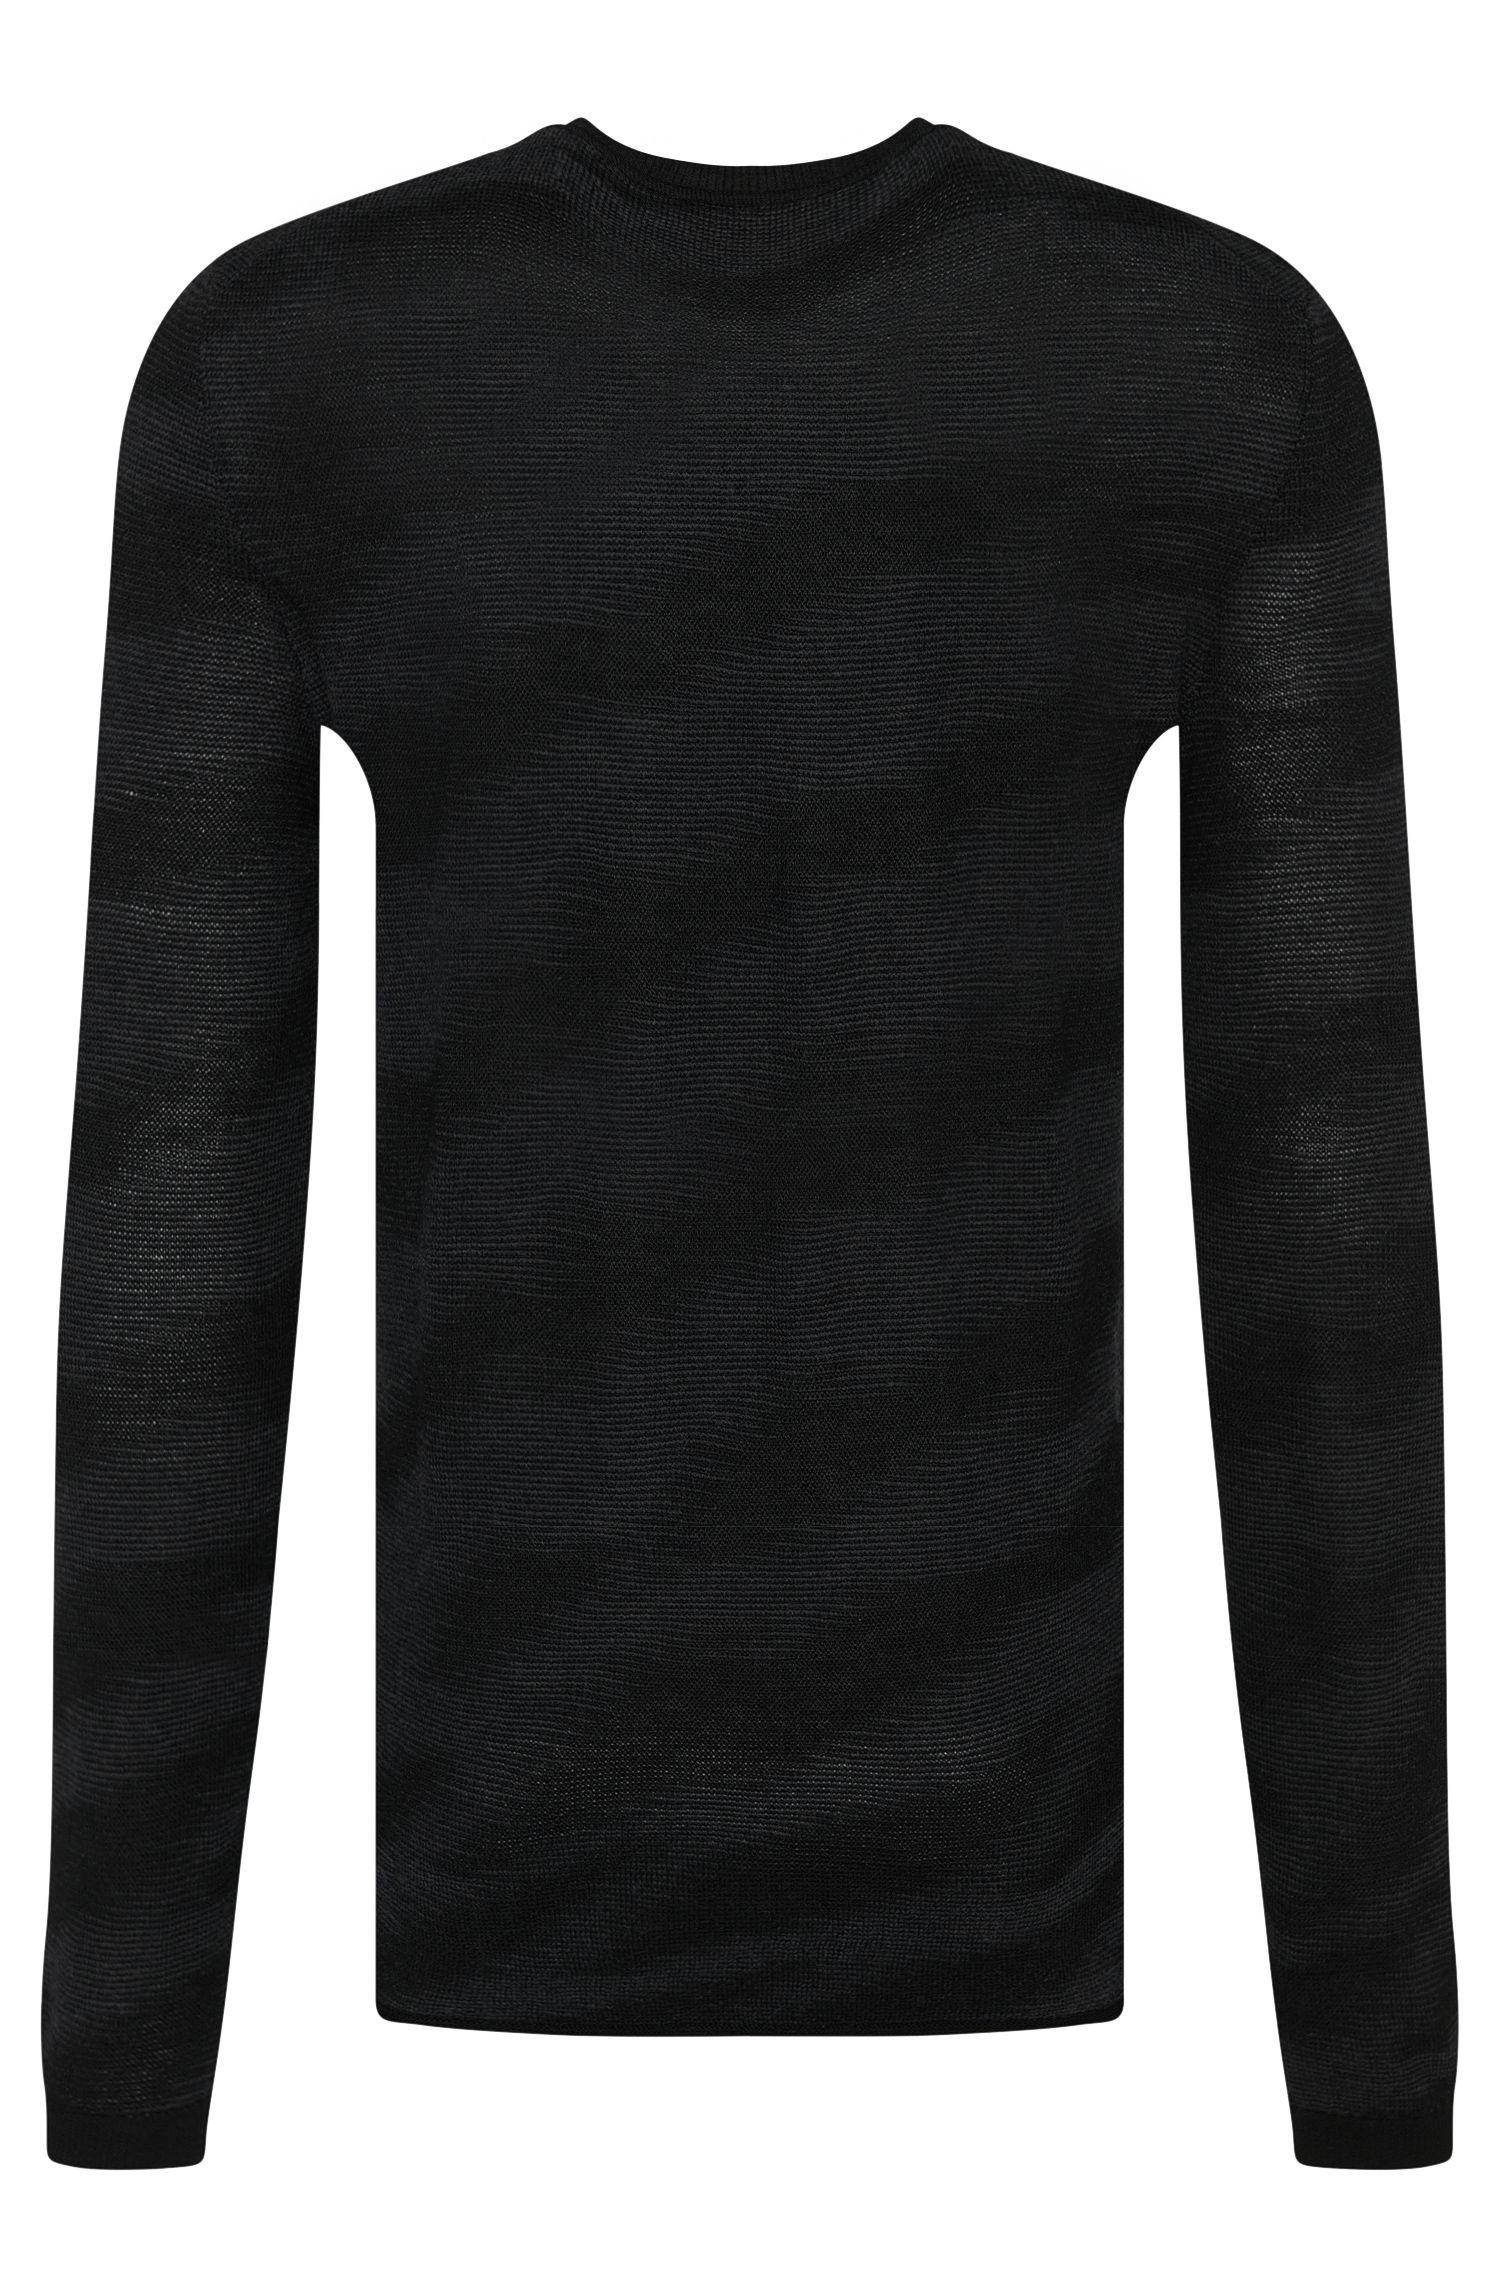 Loose-Fit Pullover aus Schurwolle mit diagonalem Allover-Muster: 'Savo'